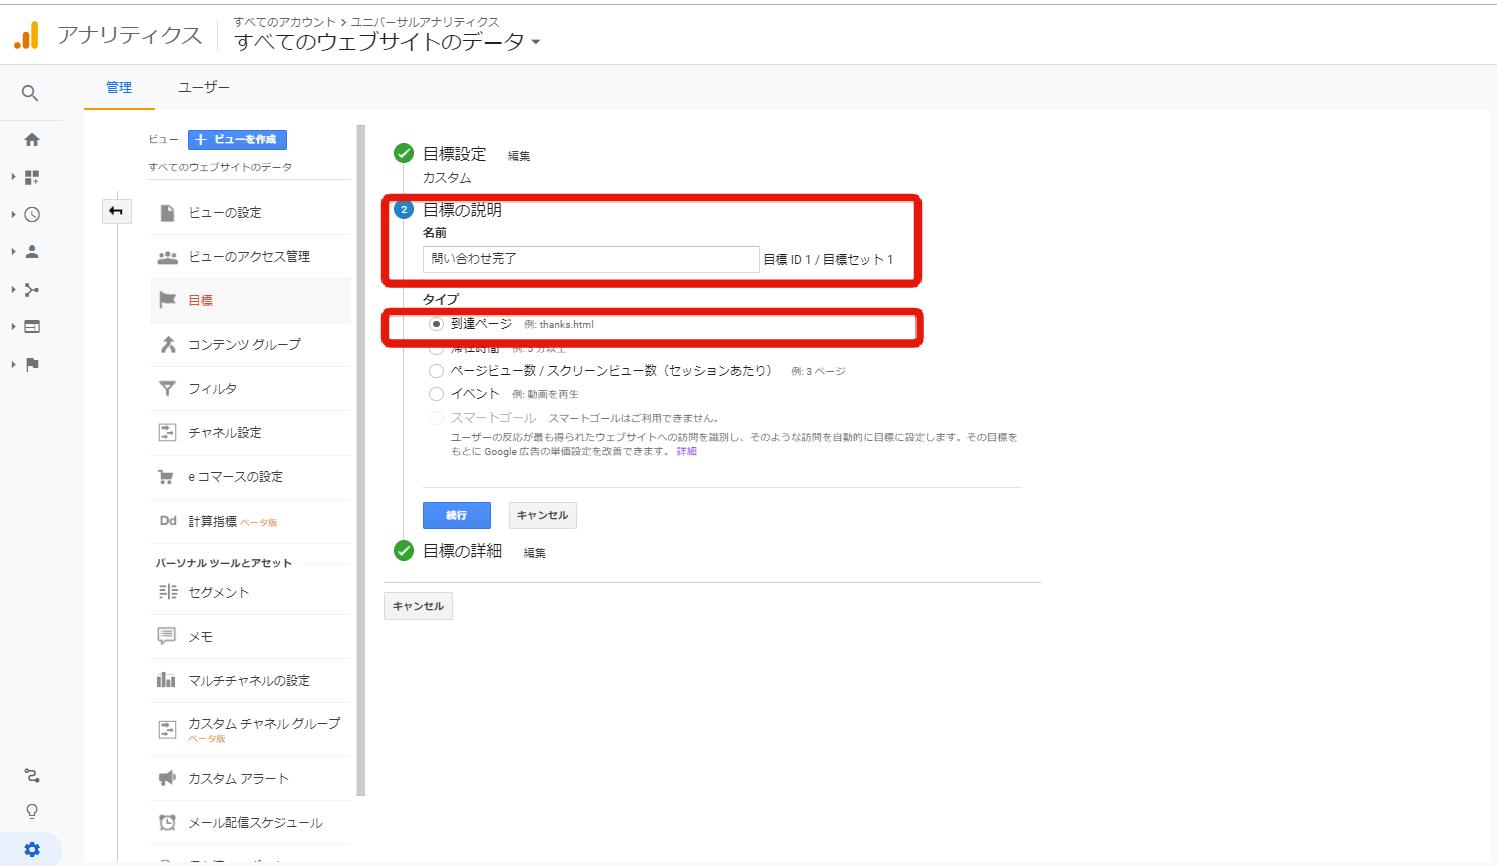 googleアナリティクスの目標到達ページの設定